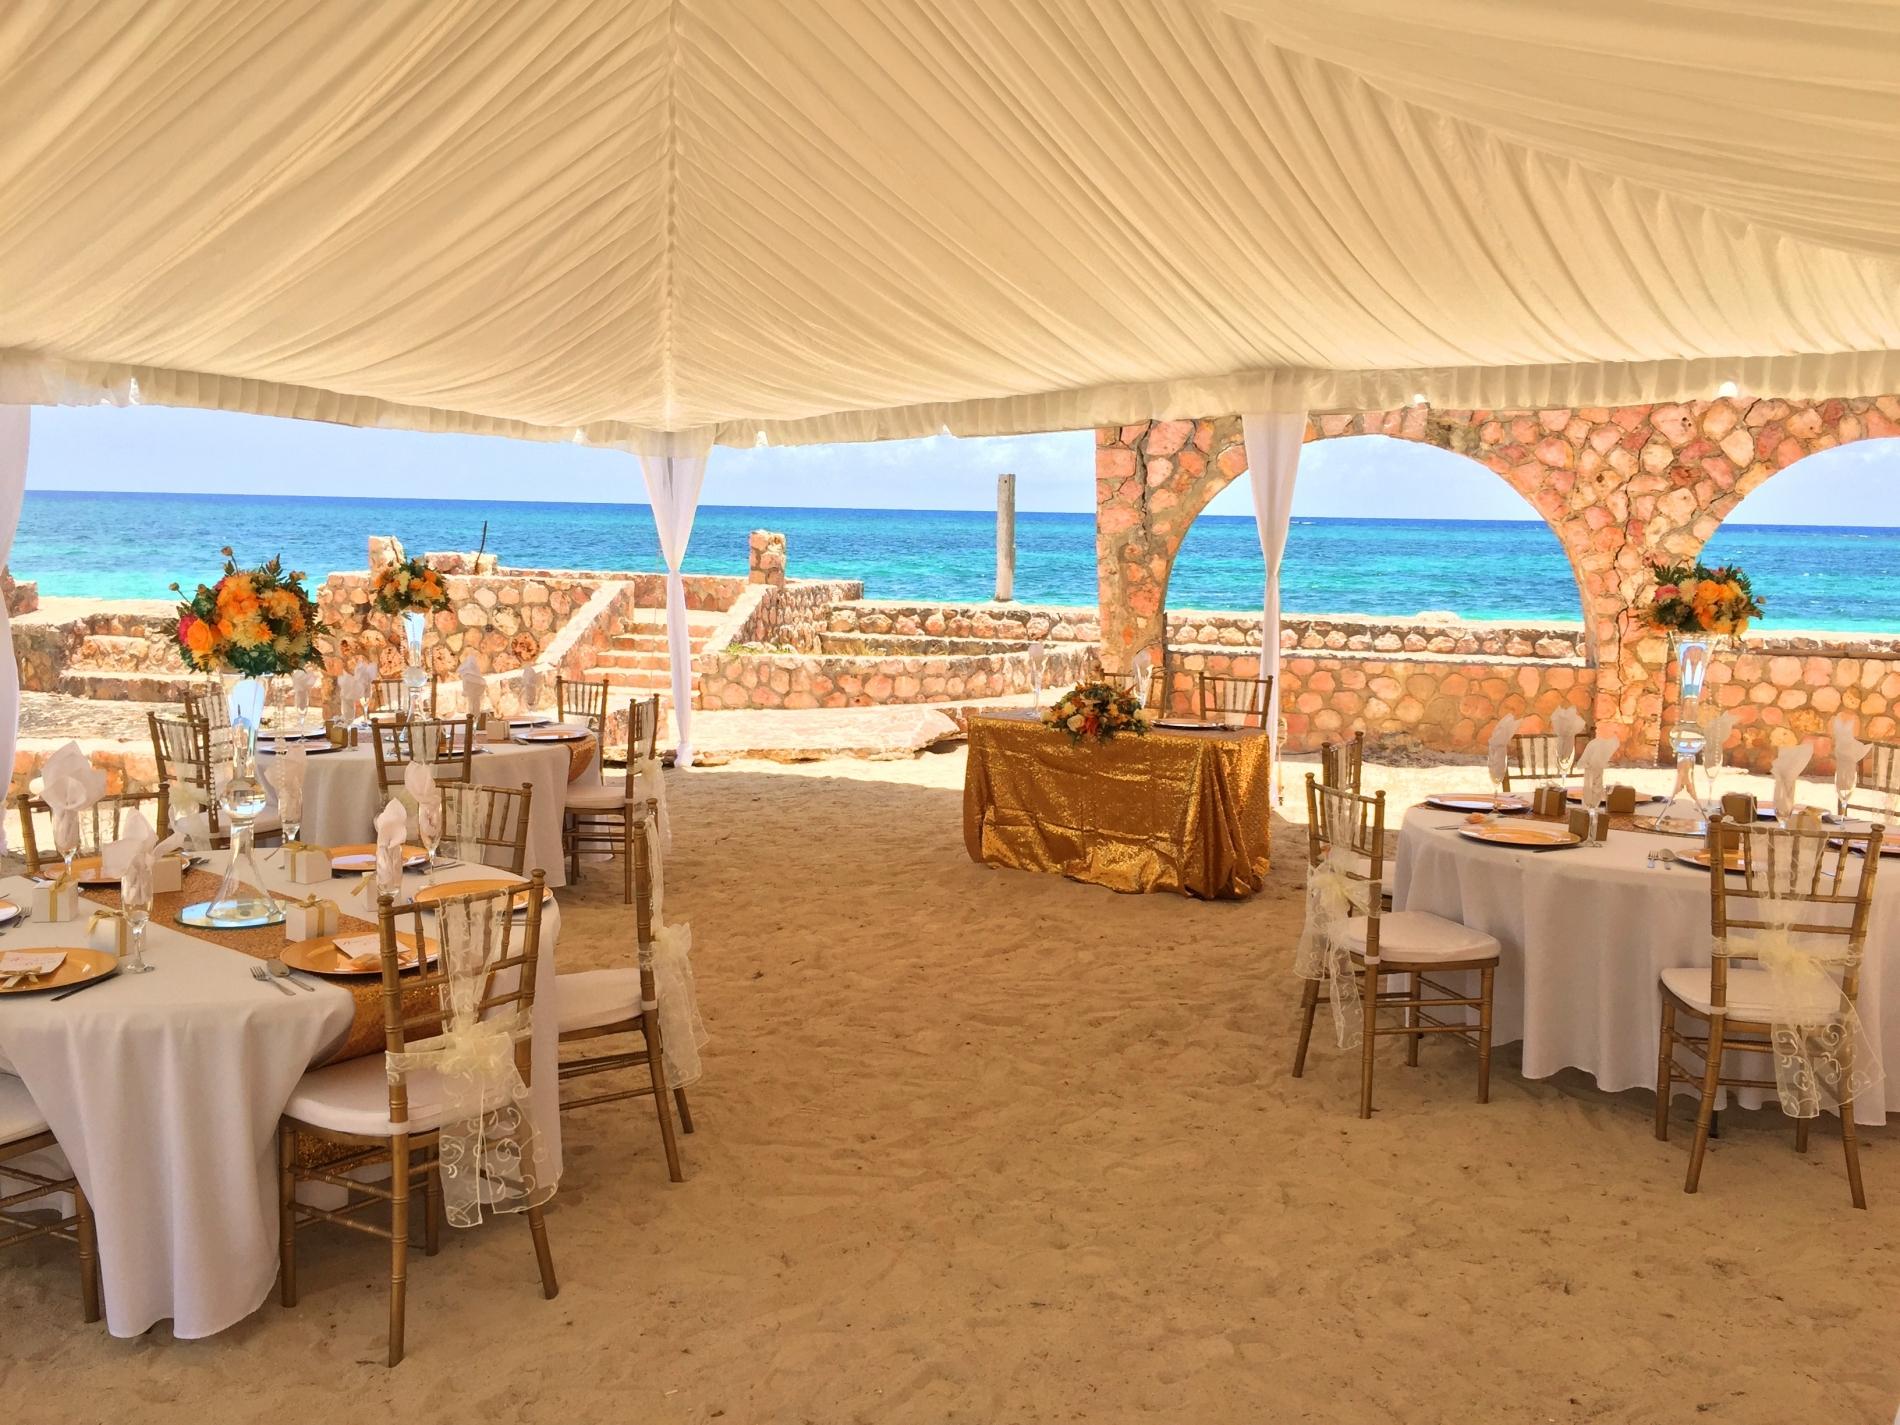 Category: Montego Bay Beach